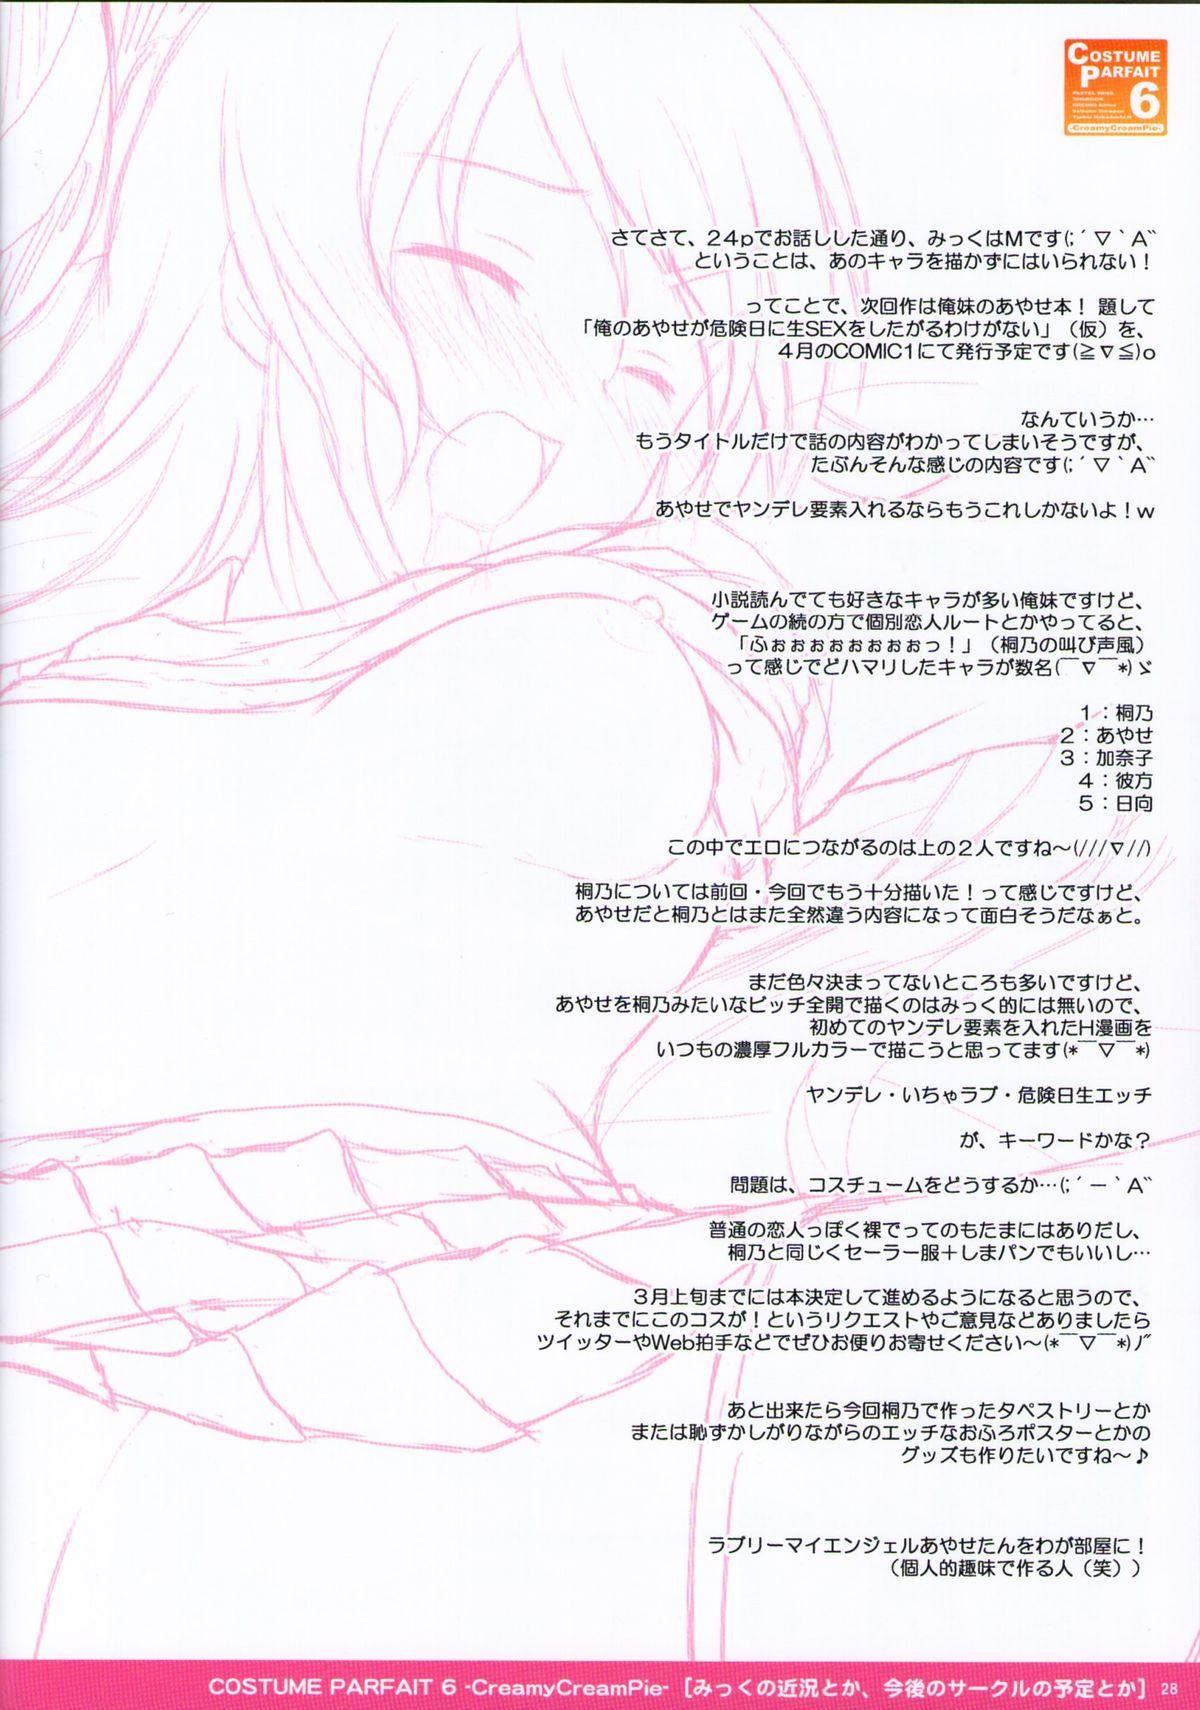 COSTUME PARFAIT 6 27